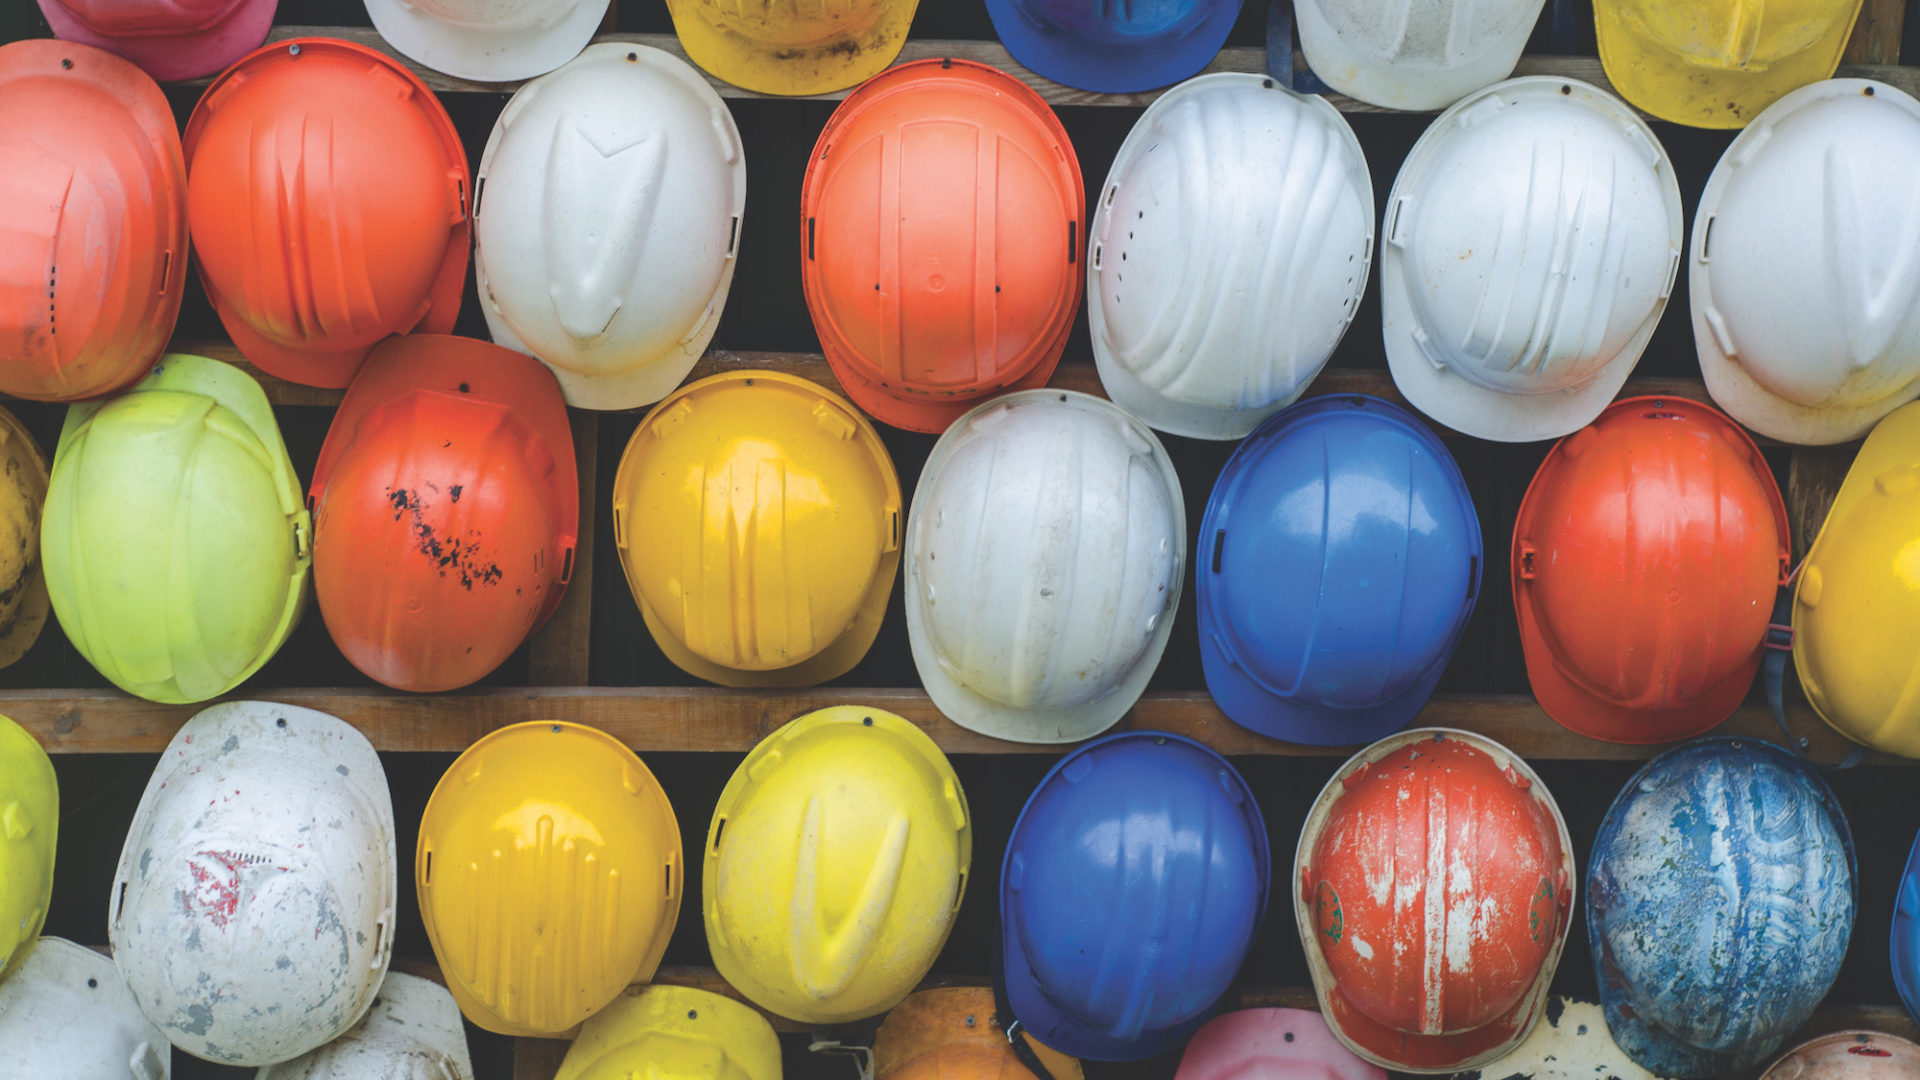 Construction site hard hats. Image: Pexels